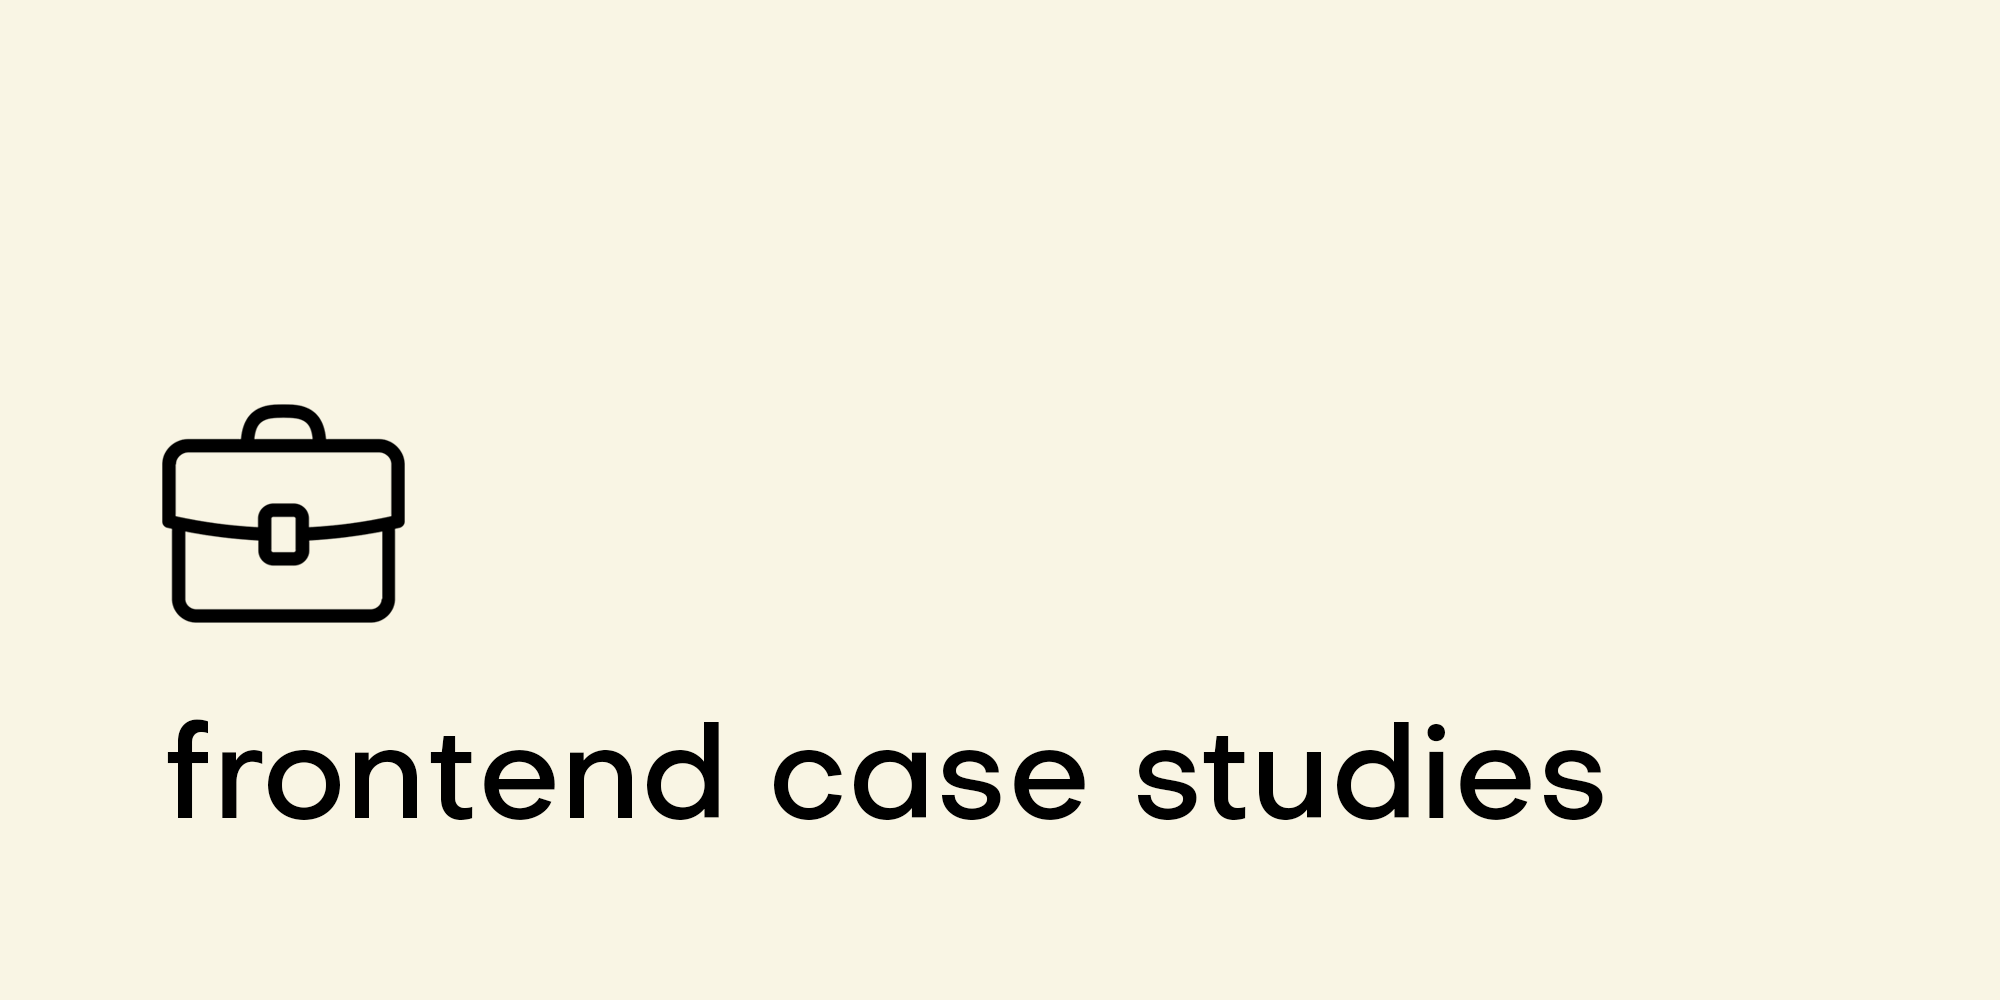 Frontend case studies logo